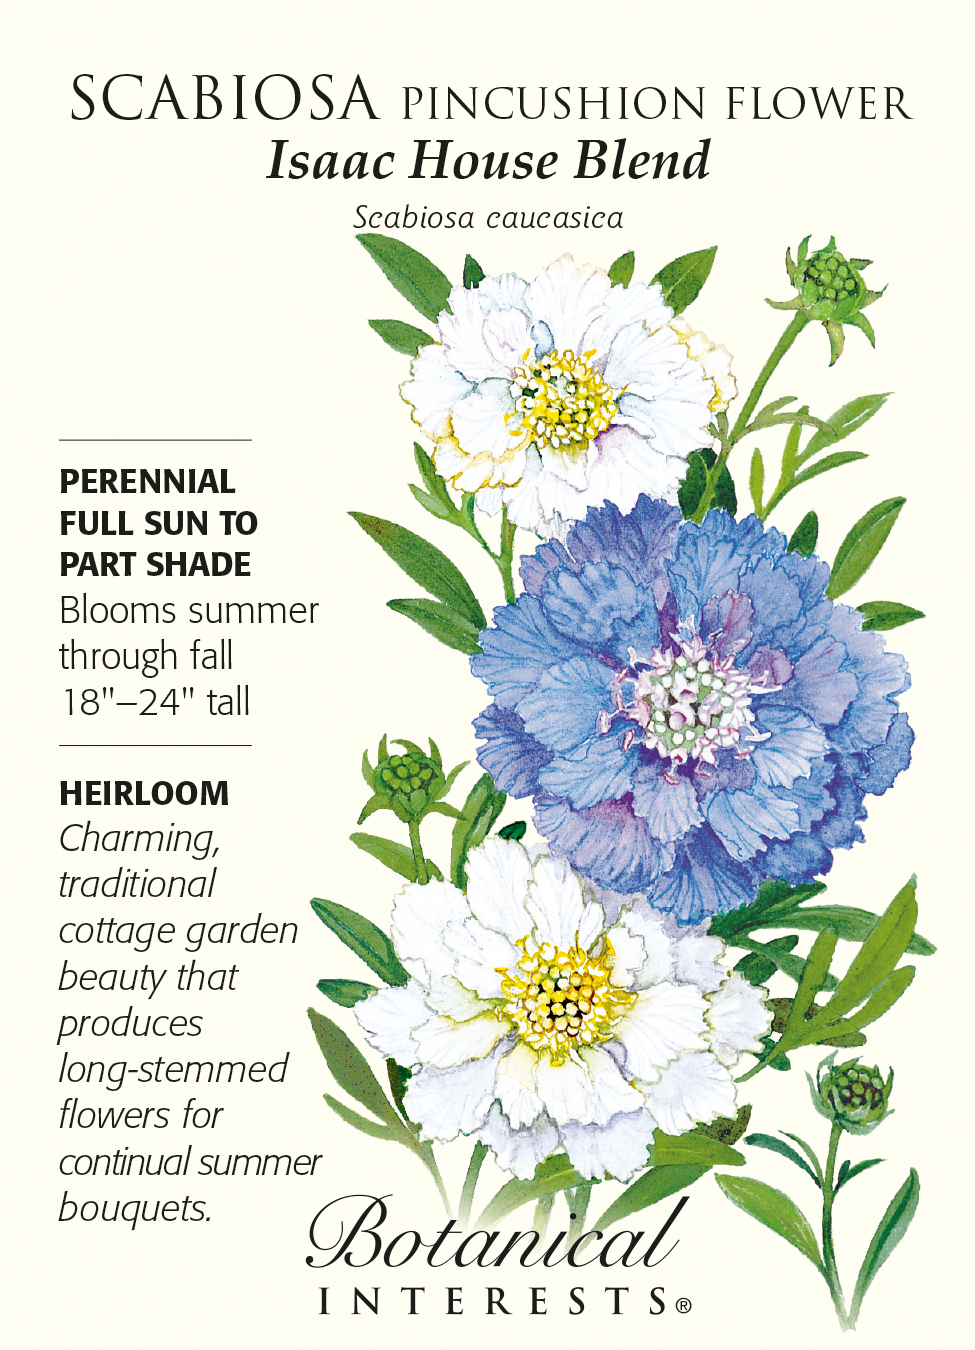 Isaac House Blend Pincushion Flower 300 Mg Scabiosa Hirts Gardens